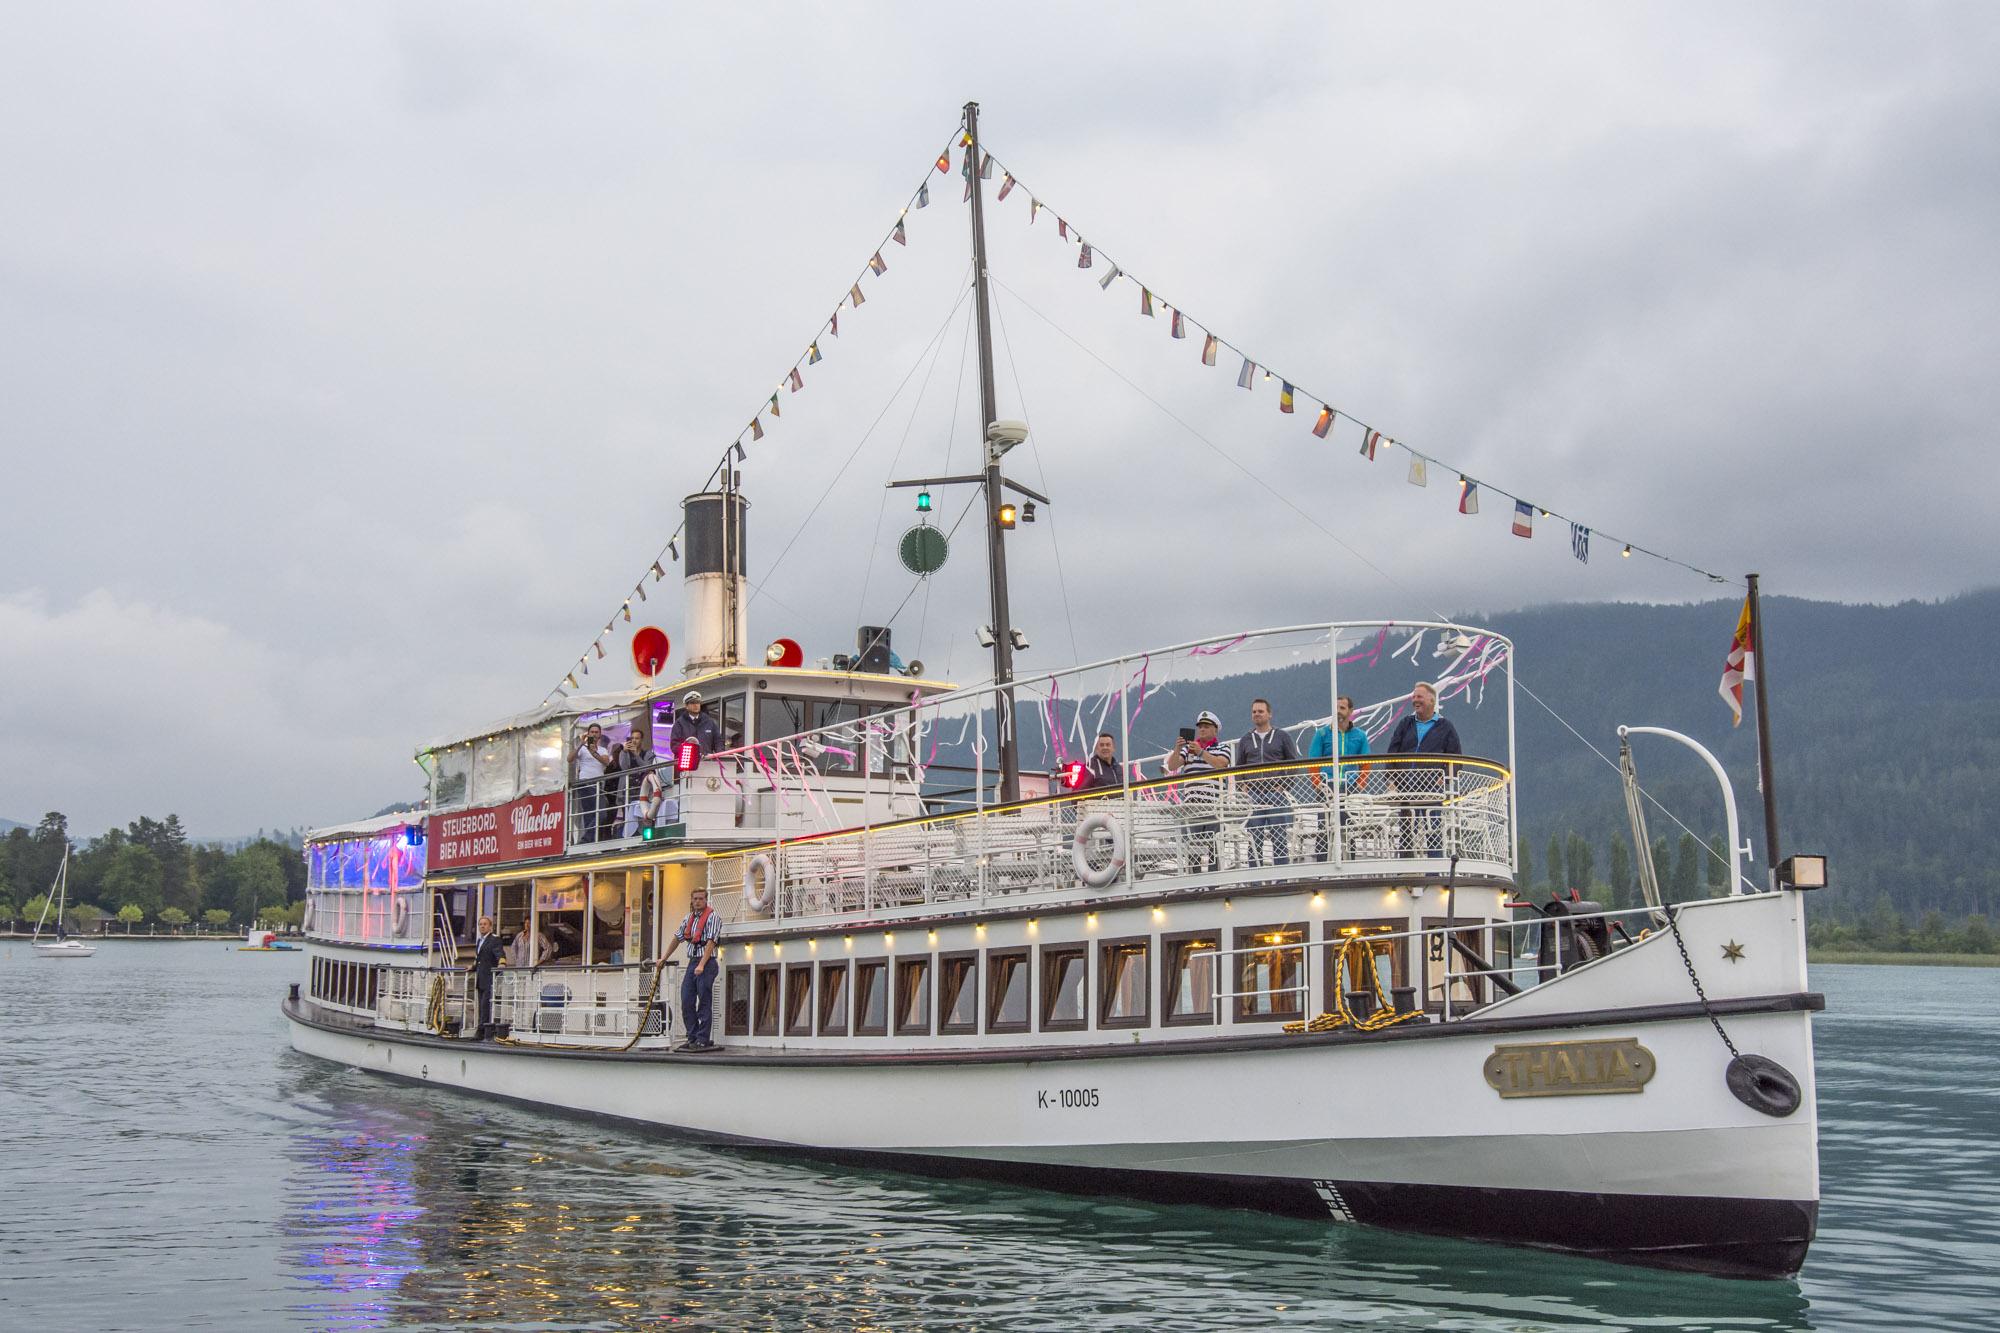 Pink-Lake-Boat-Cruise-Boarding-2019-4